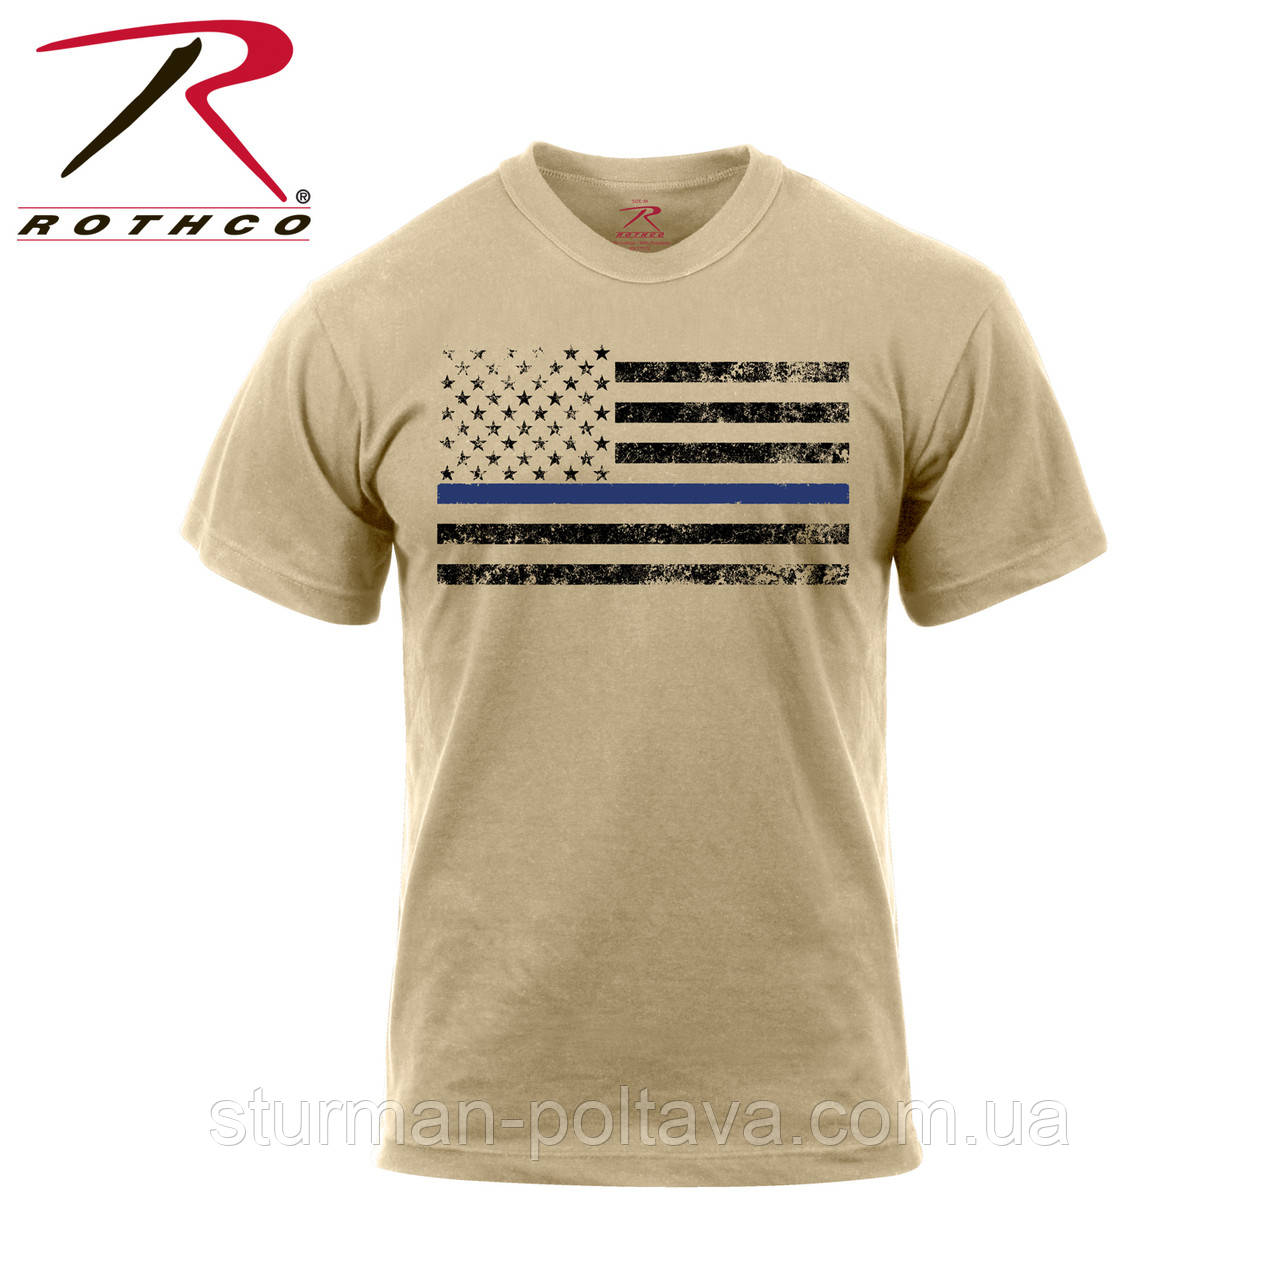 Футболка мужская  милитари  бежевая  с флагом США Rothco